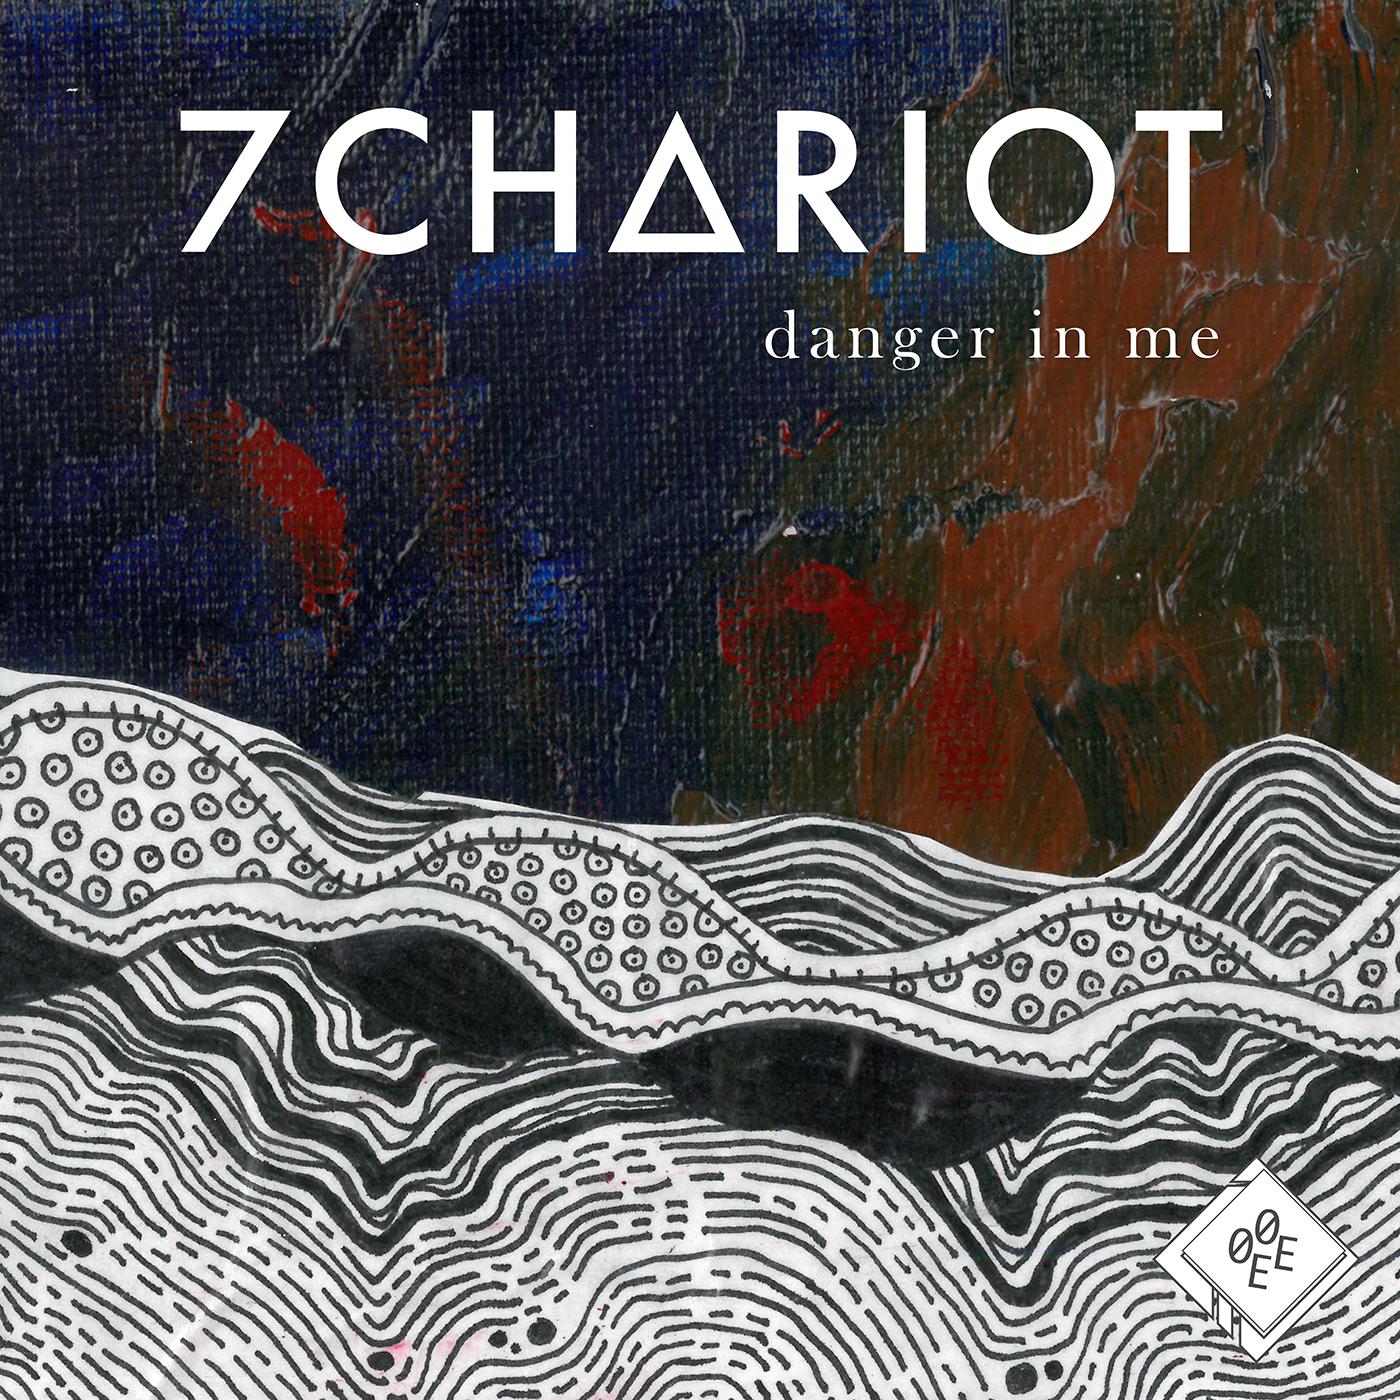 7chariot - richochet - 1400.jpg